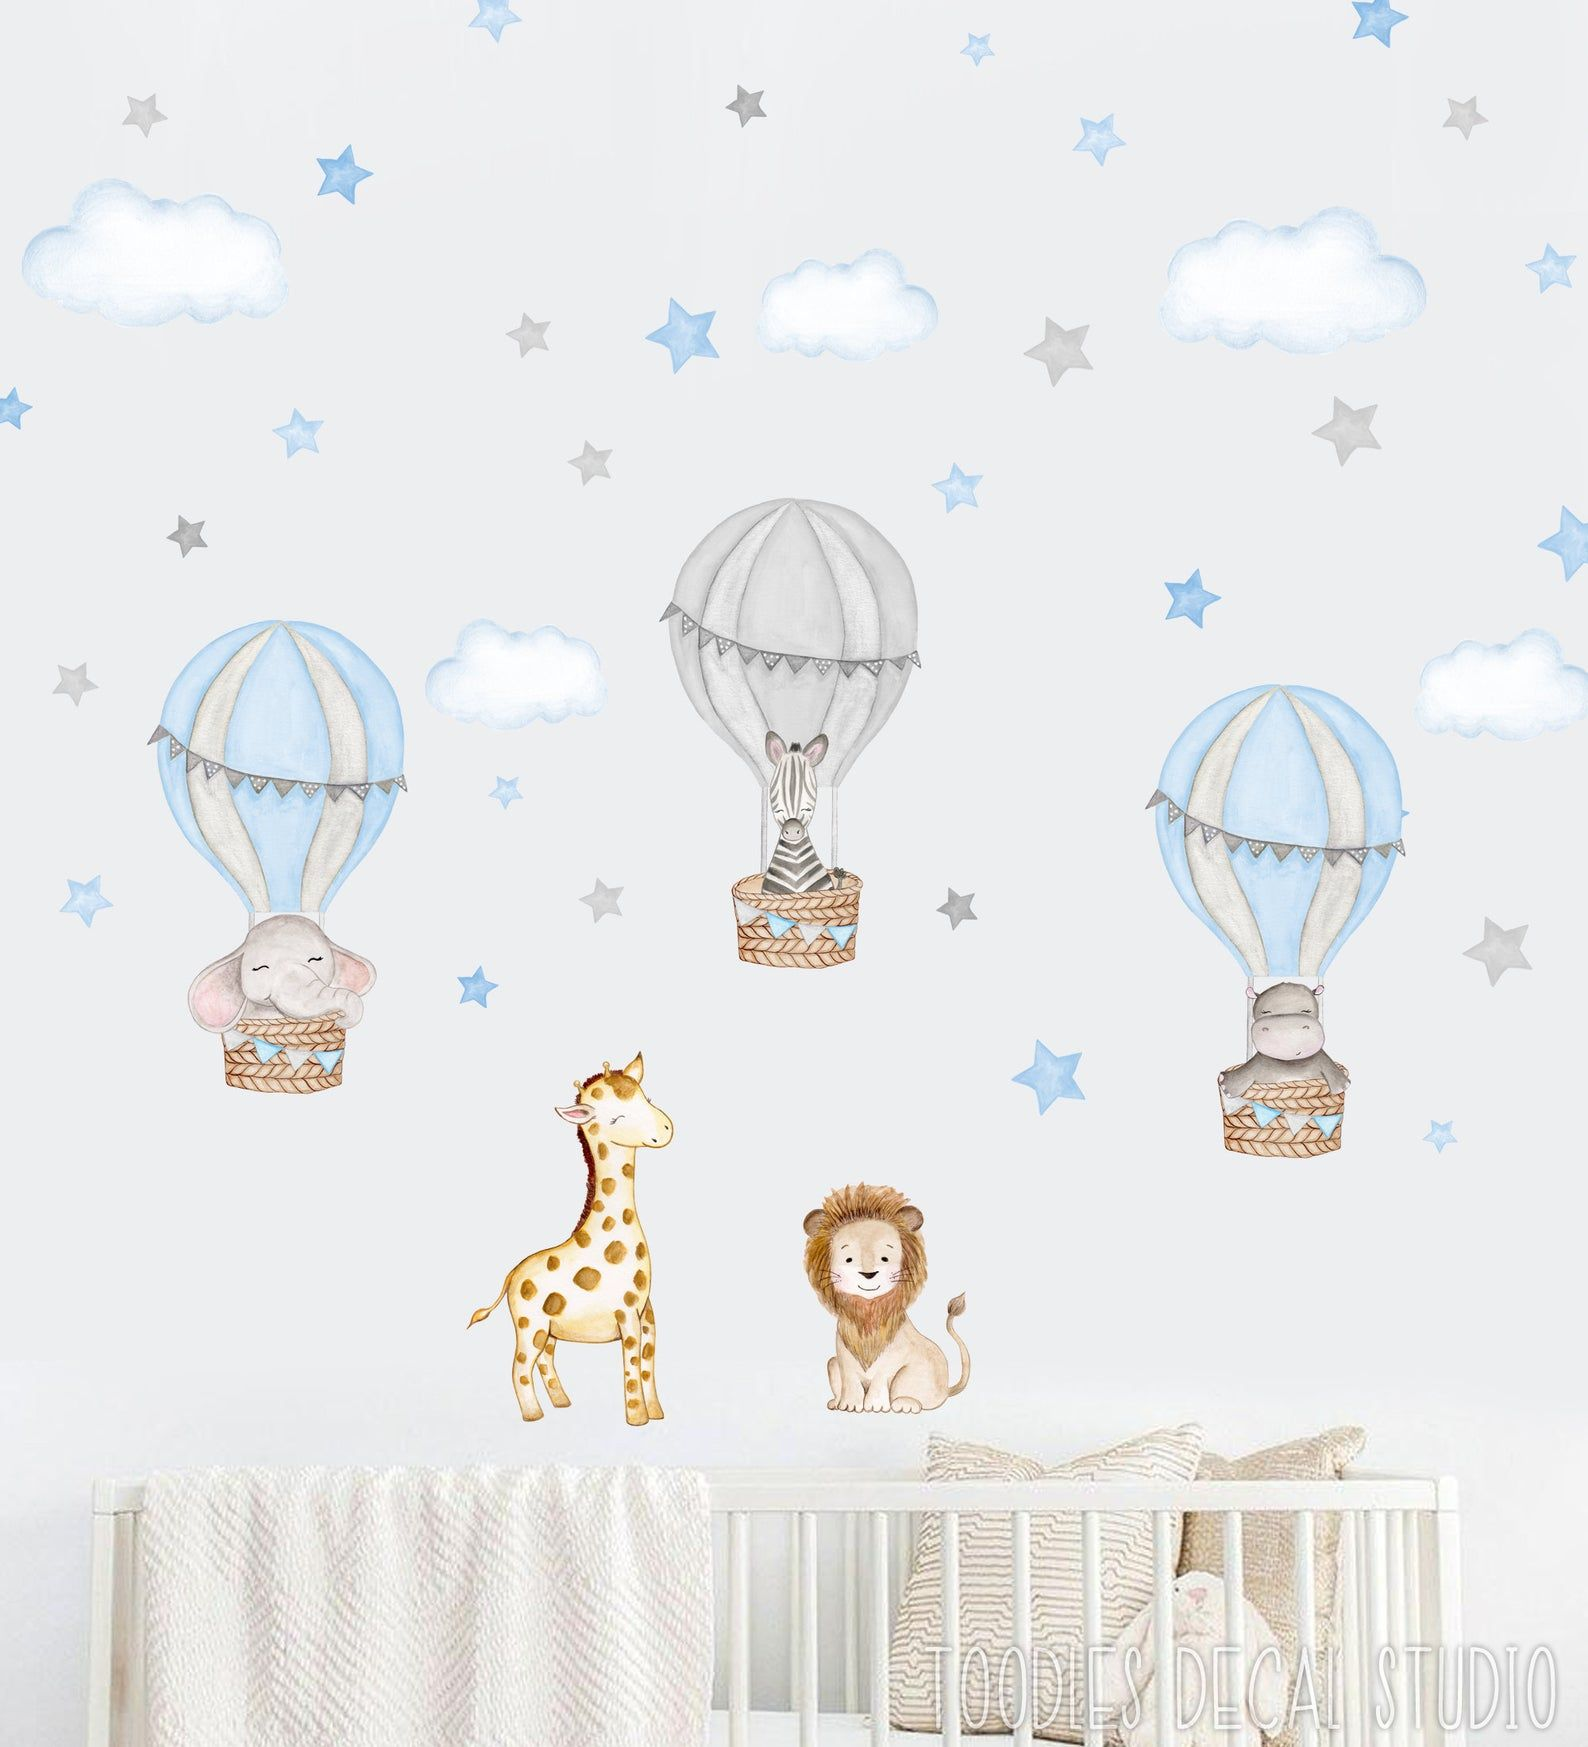 Watercolor Safari decal hot air balloons stickers cute